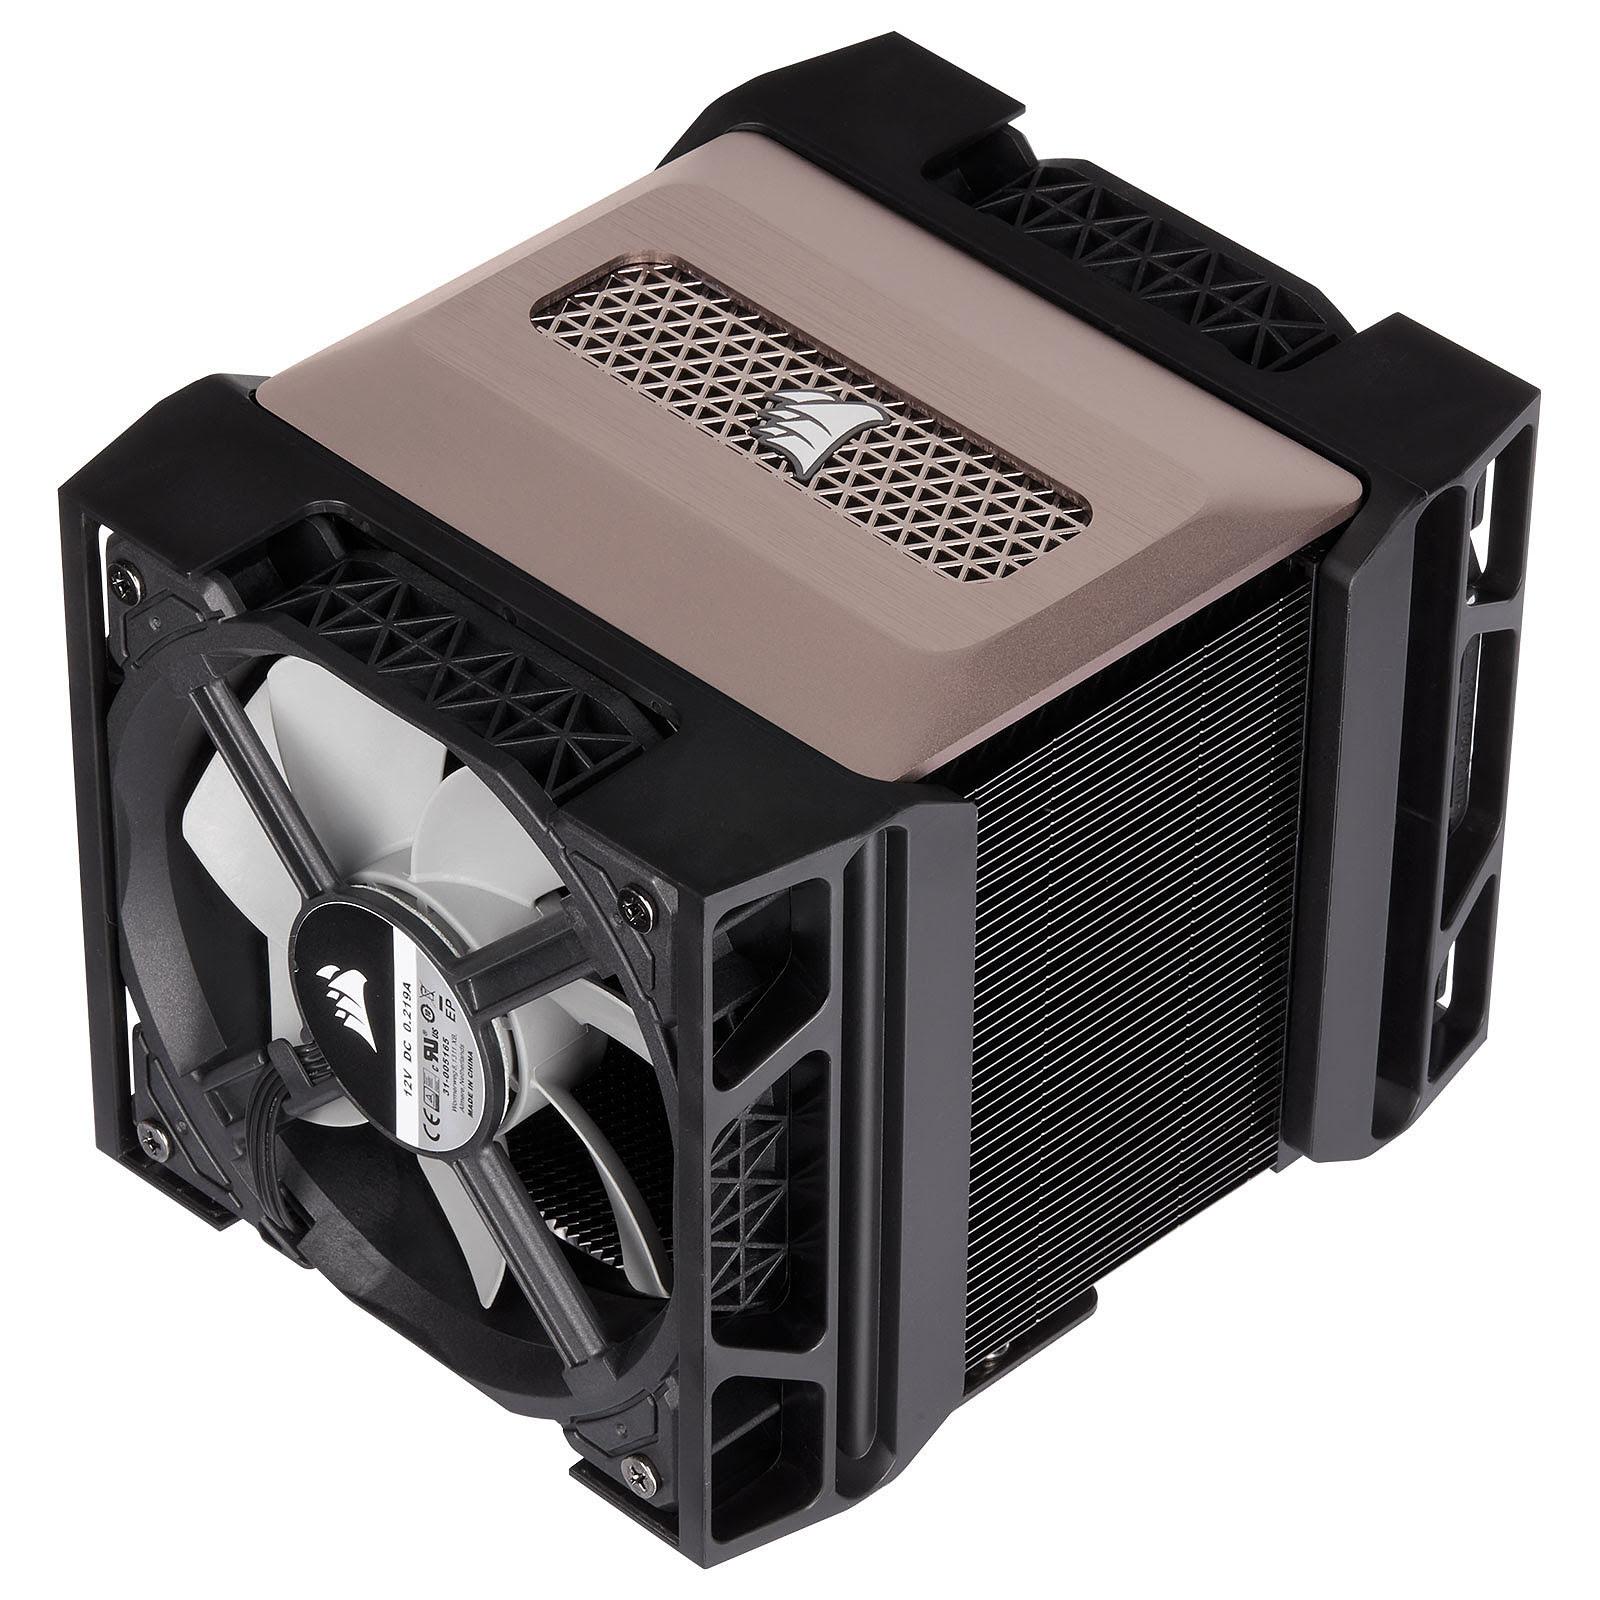 Corsair A500 Air Cooler - Ventilateur CPU Corsair - Cybertek.fr - 0